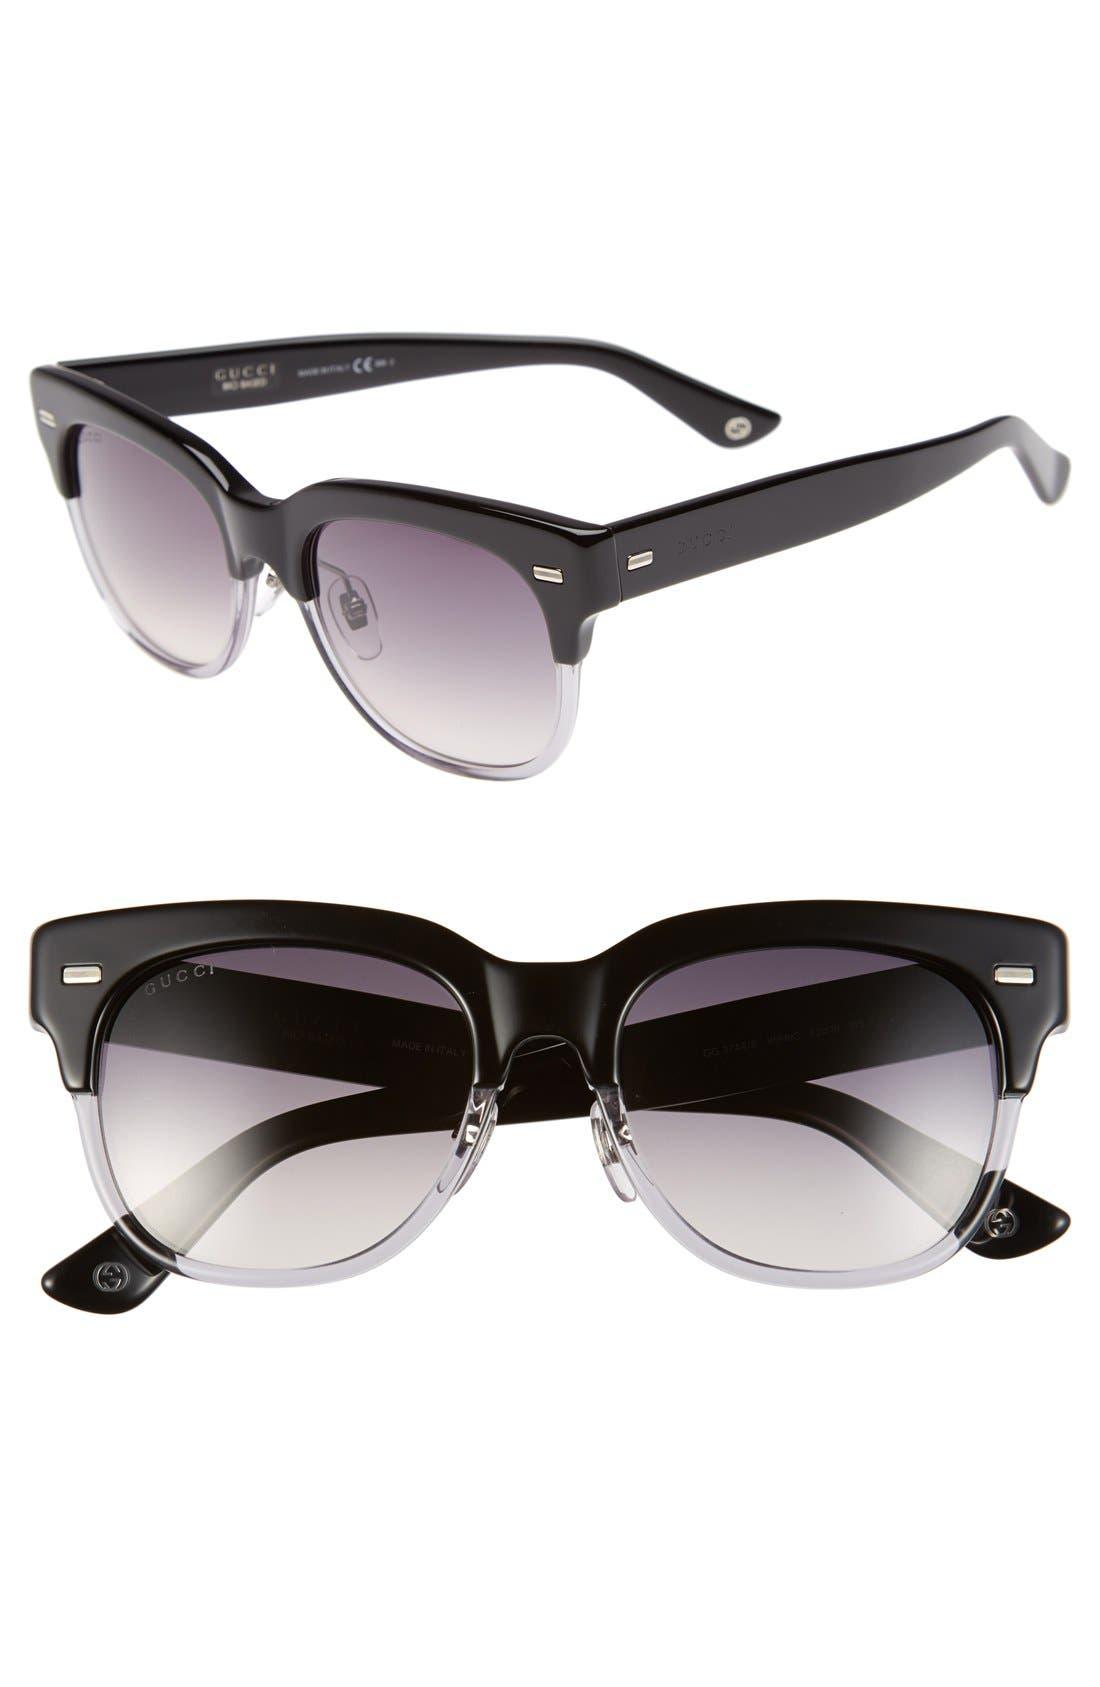 52mm Retro Sunglasses,                             Main thumbnail 1, color,                             001